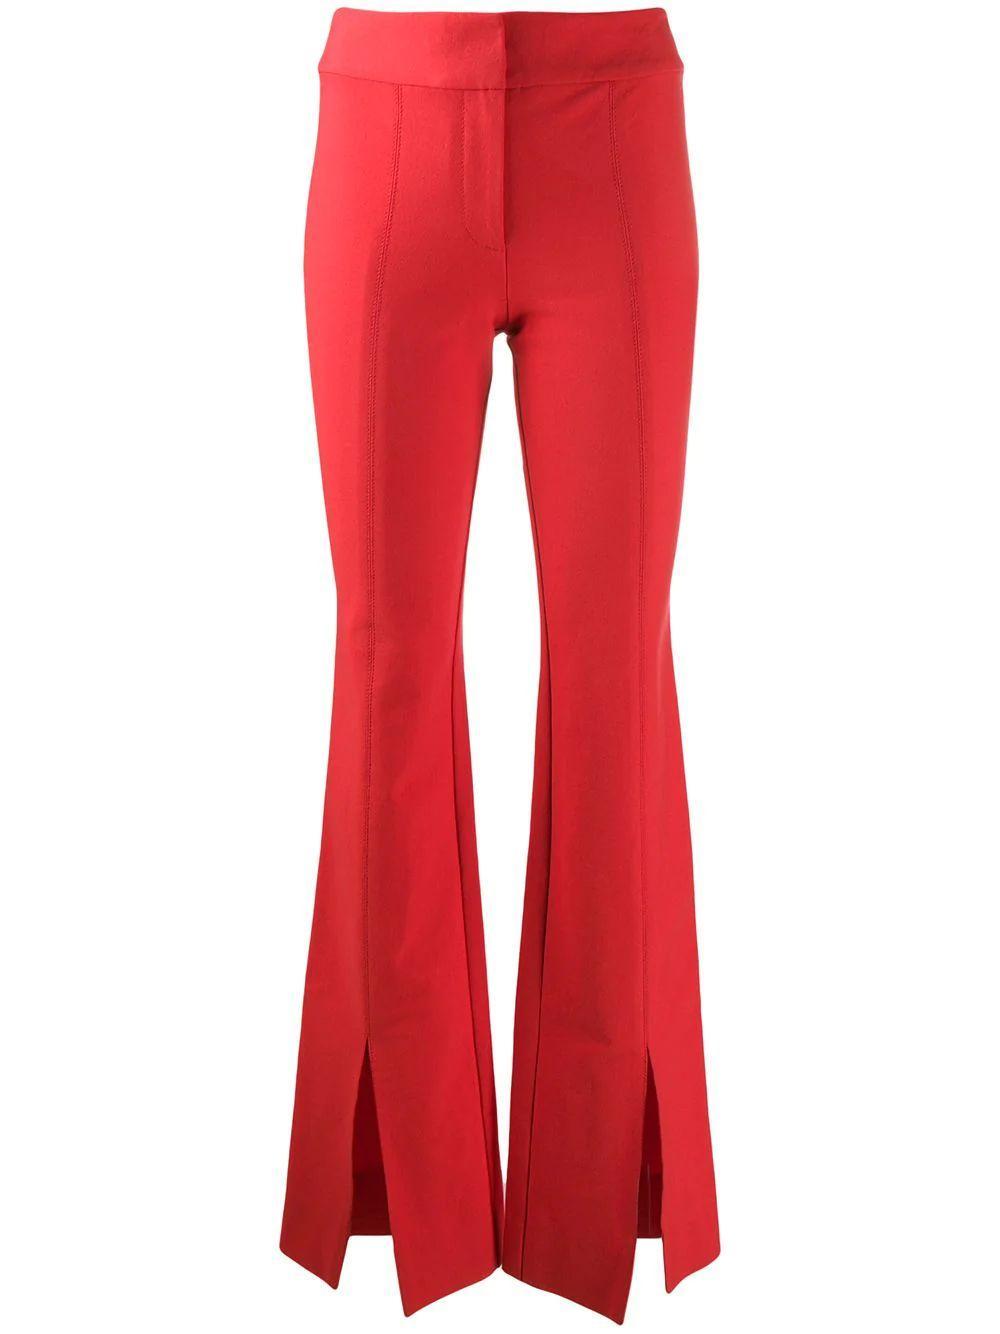 Maeve Slit Hem Flare Trouser Item # TR01117CR